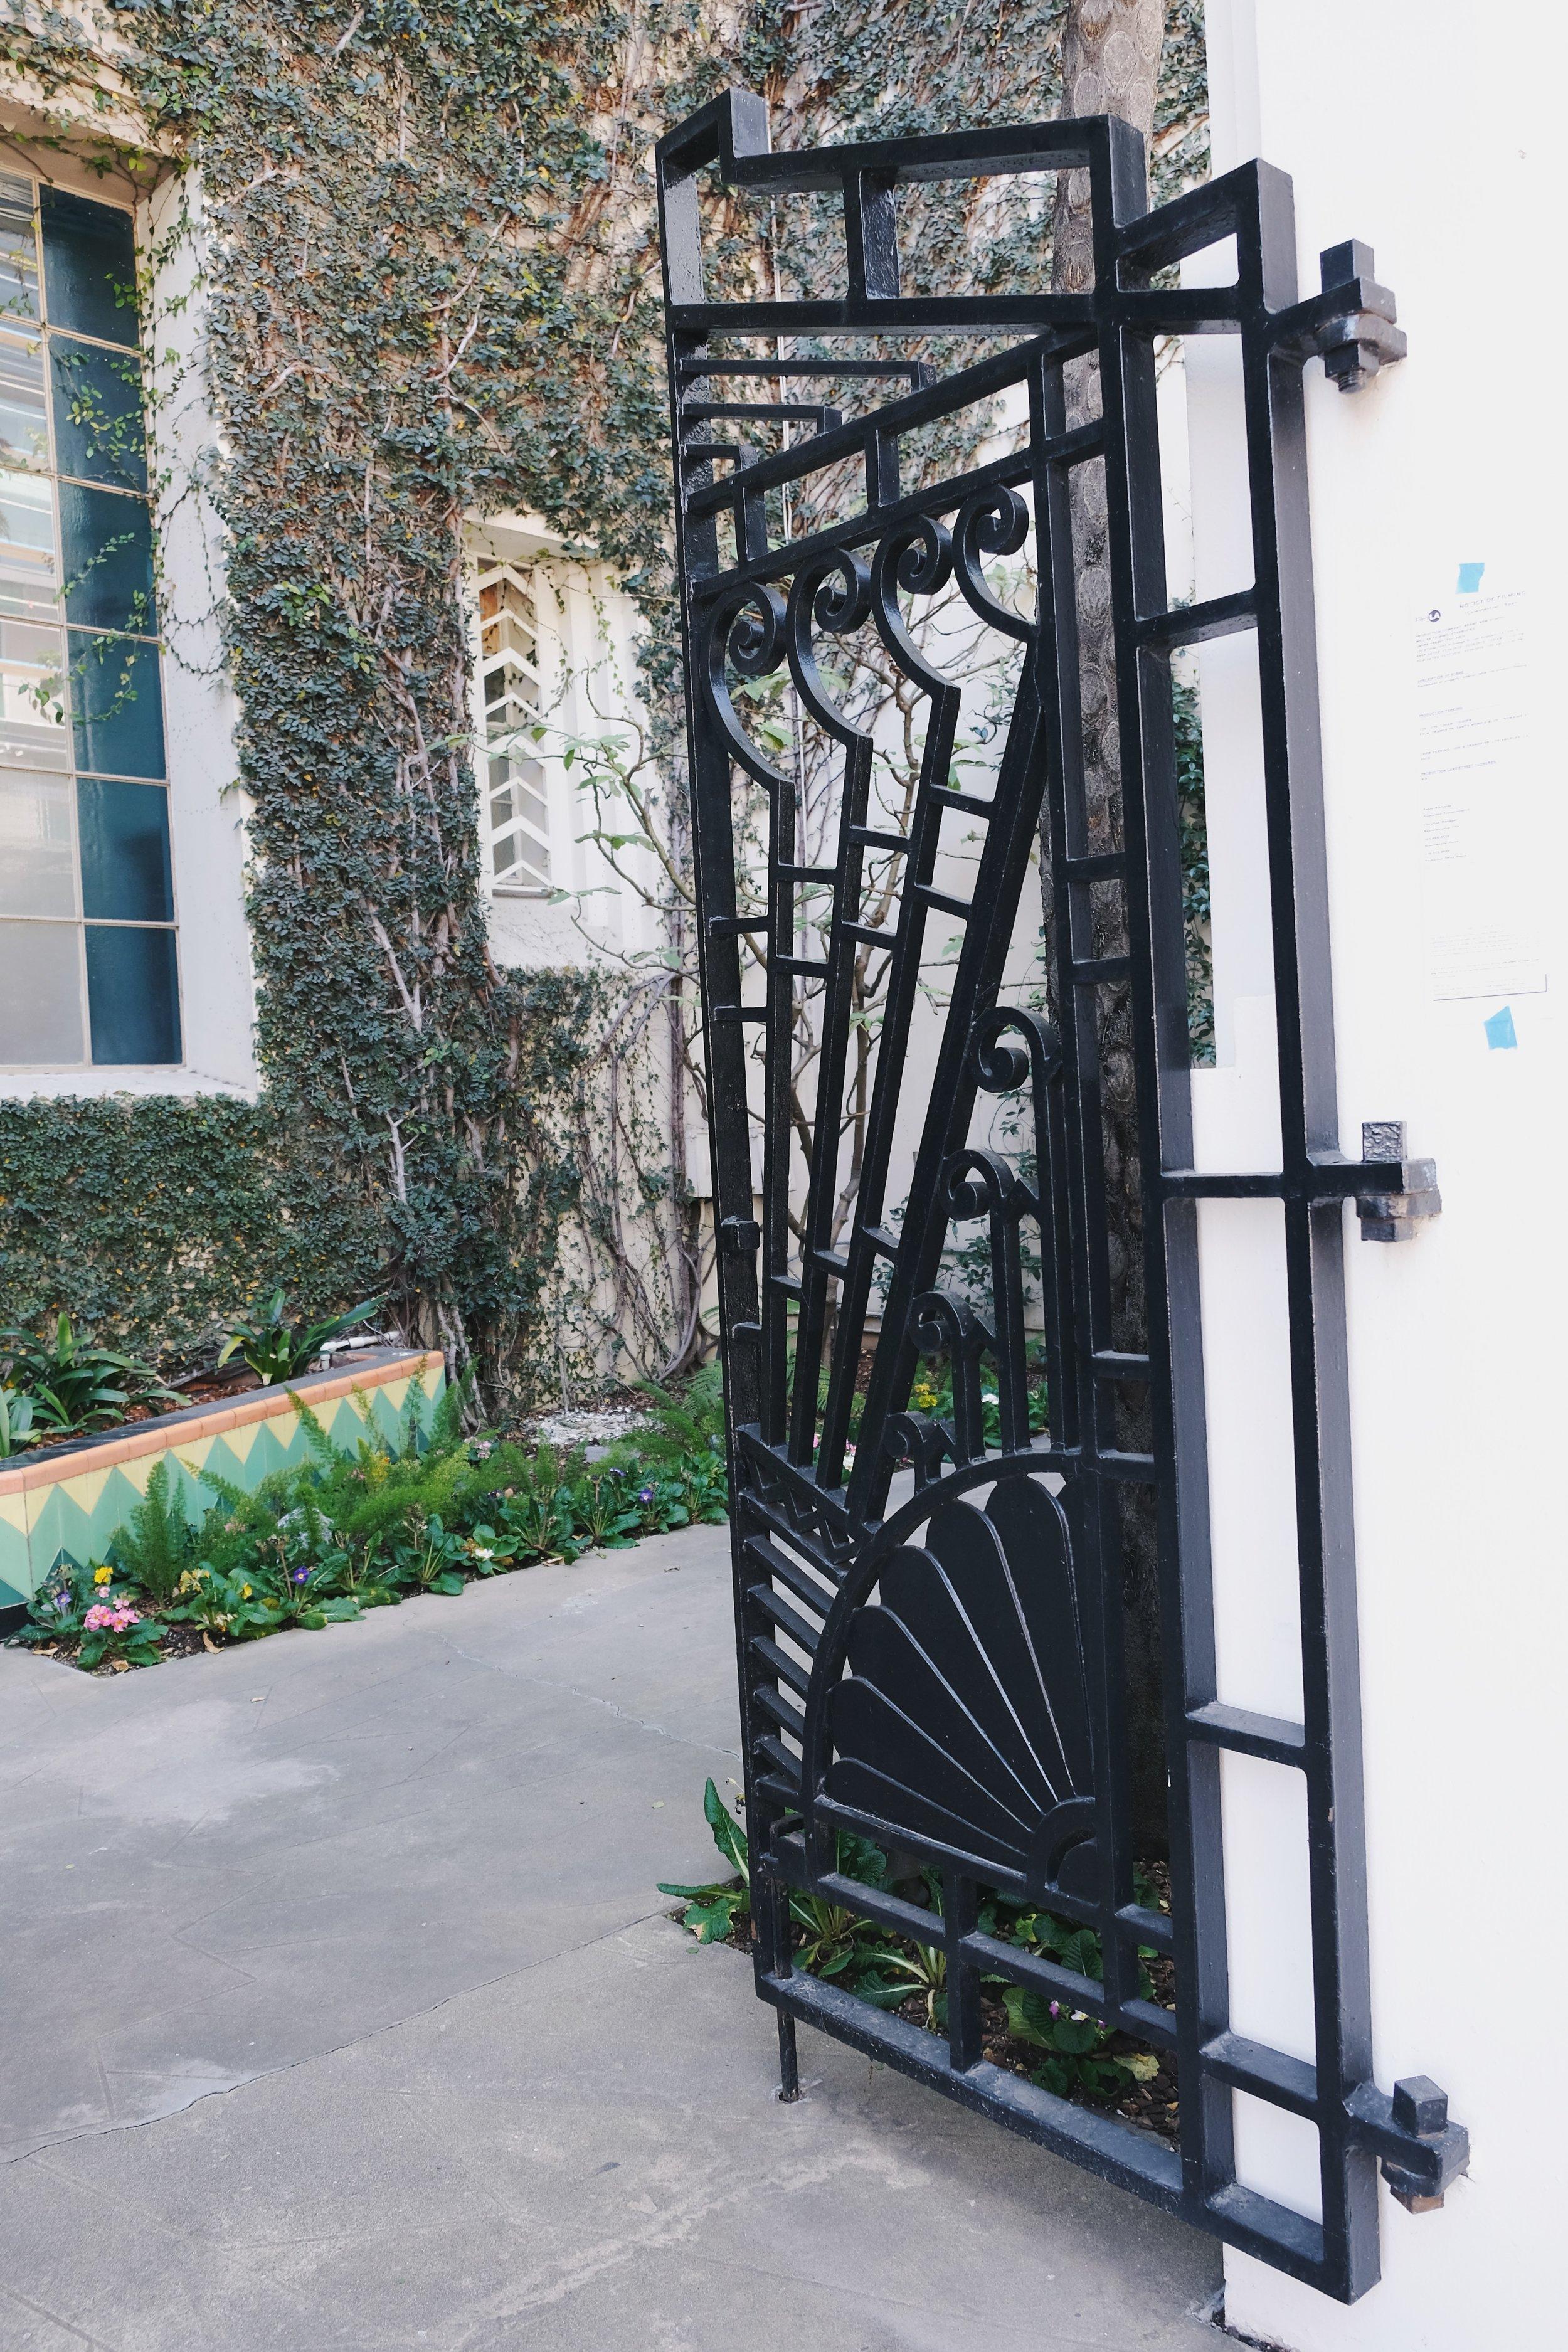 Howard-Hughes-HQ-7000-Romaine-2019-11